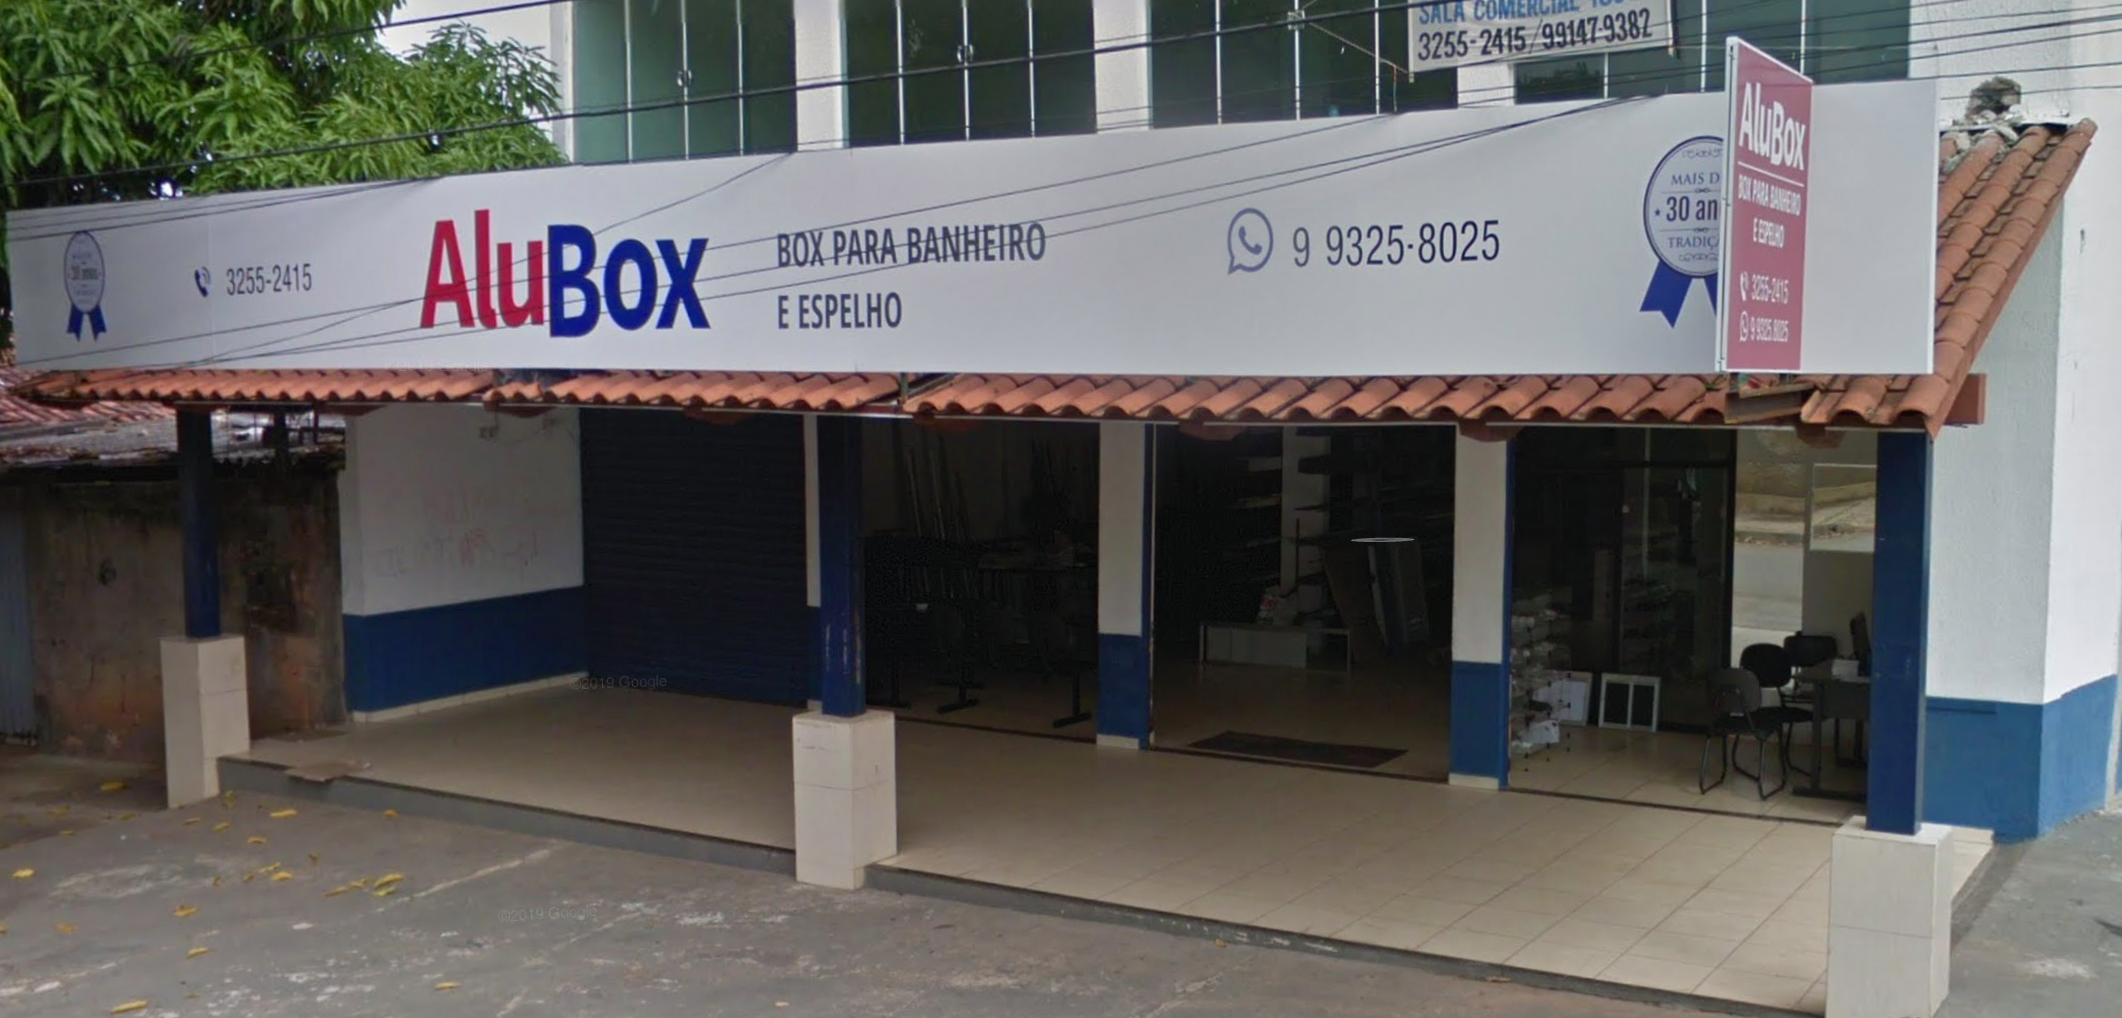 Alubox Box Para Banheiros 62 3255 2415